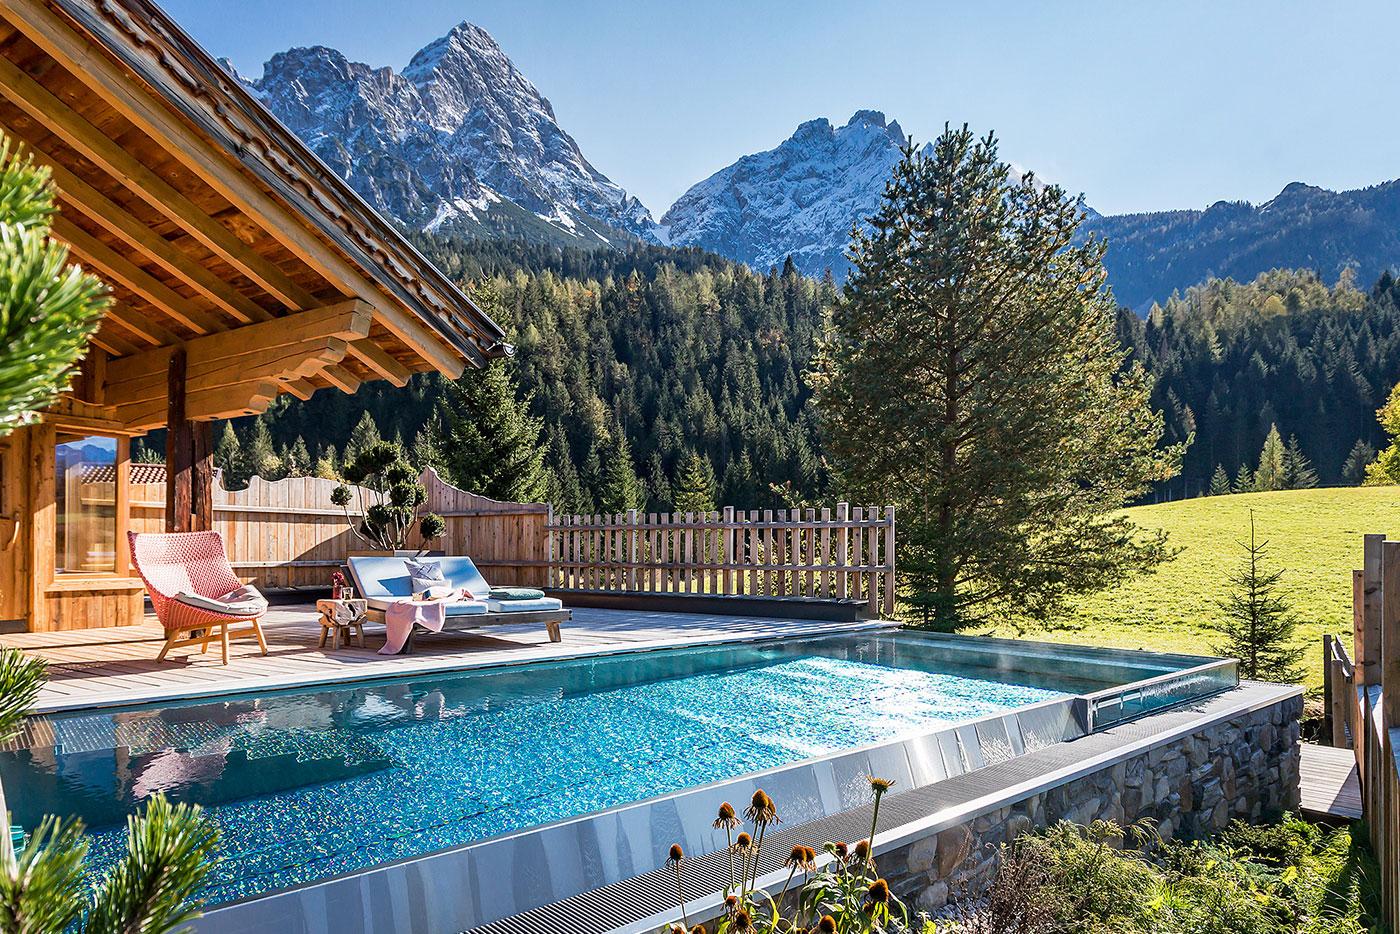 laPosch-chalet-infinity-pool_sst-saurwein-schwimmbad-technik-pool-refernz-02